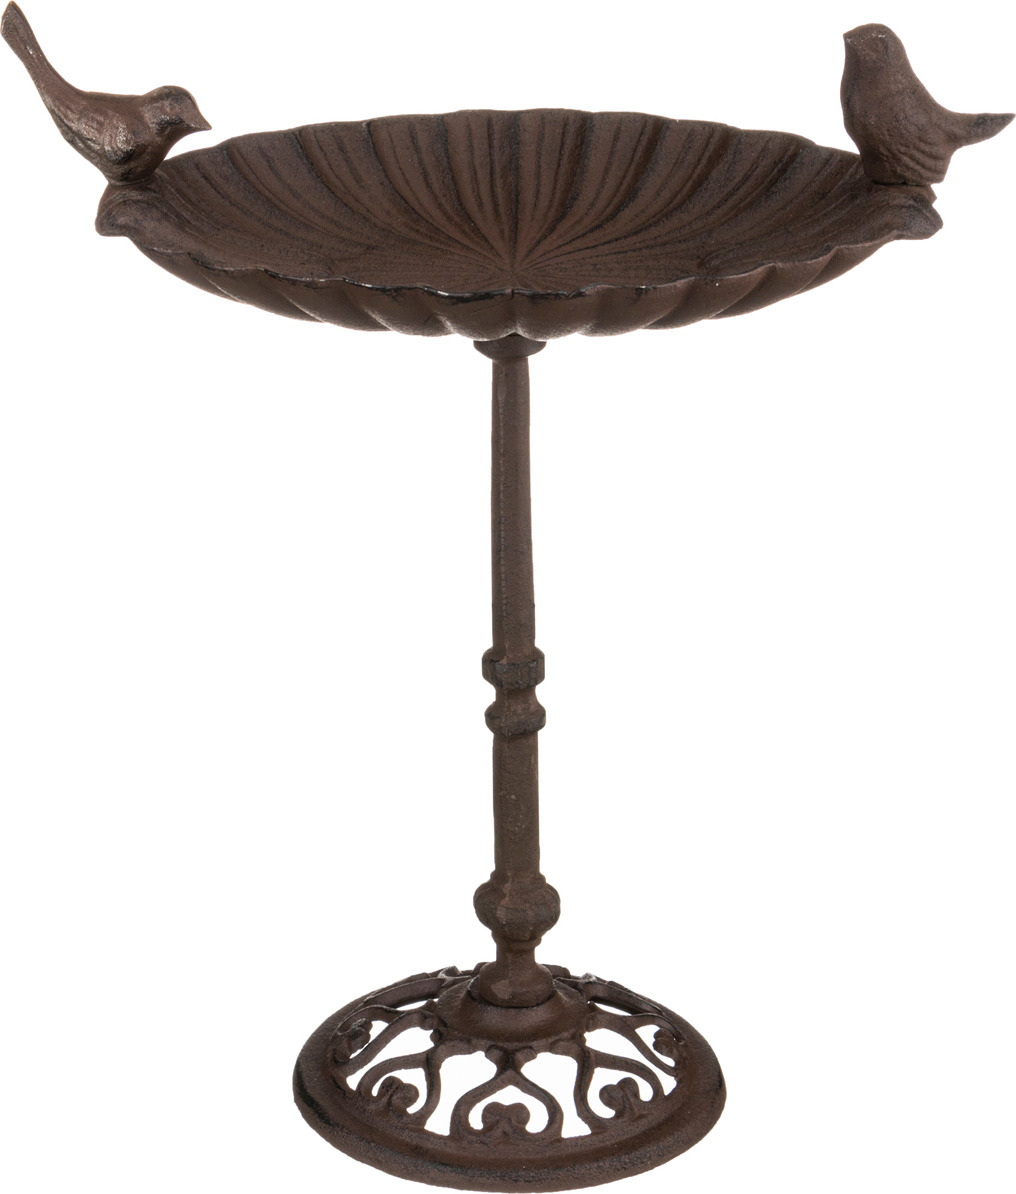 цены на Подставка декоративная Lefard, 768-517, коричневый, 33 х 23 х 3 см  в интернет-магазинах